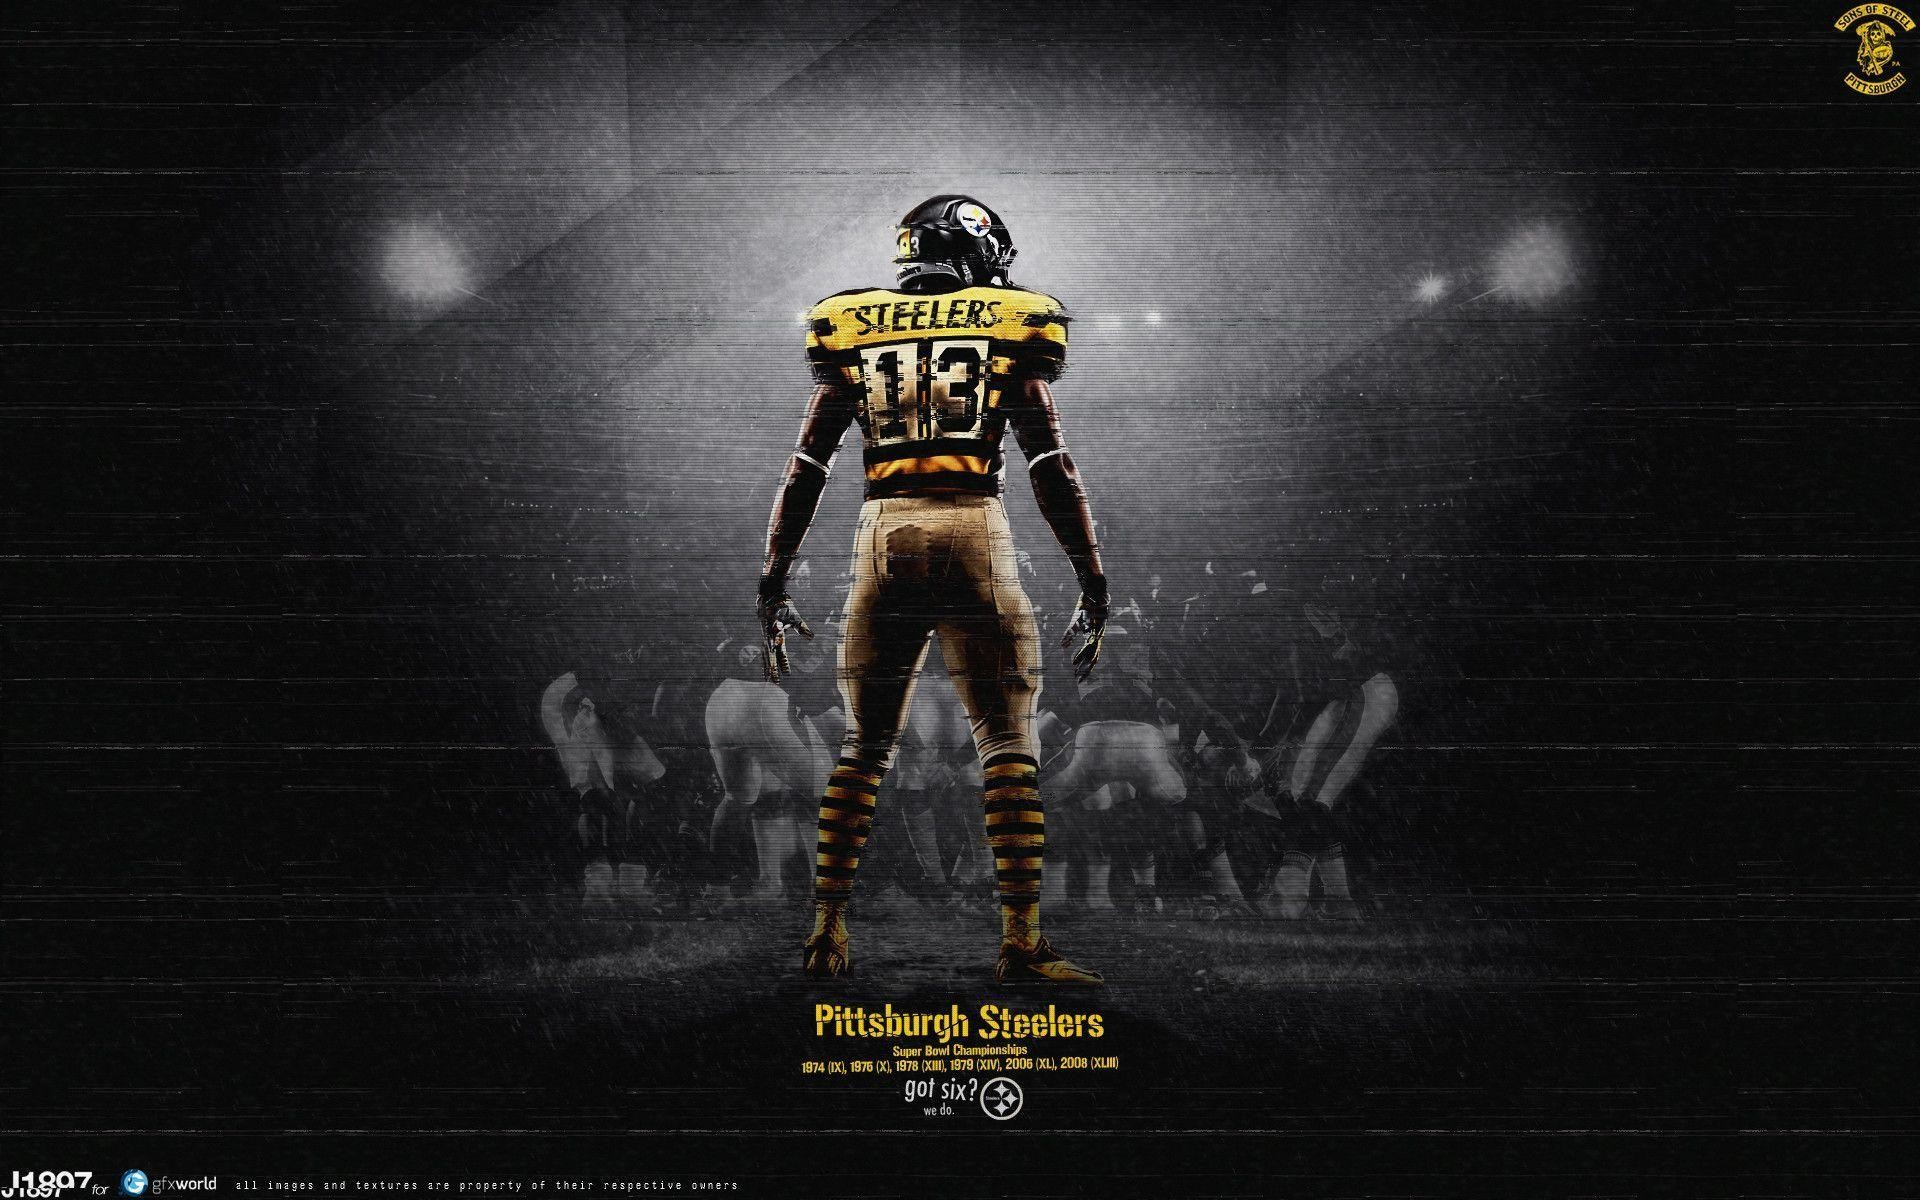 Pittsburg Steelers Wallpapers – Wallpaper Cave